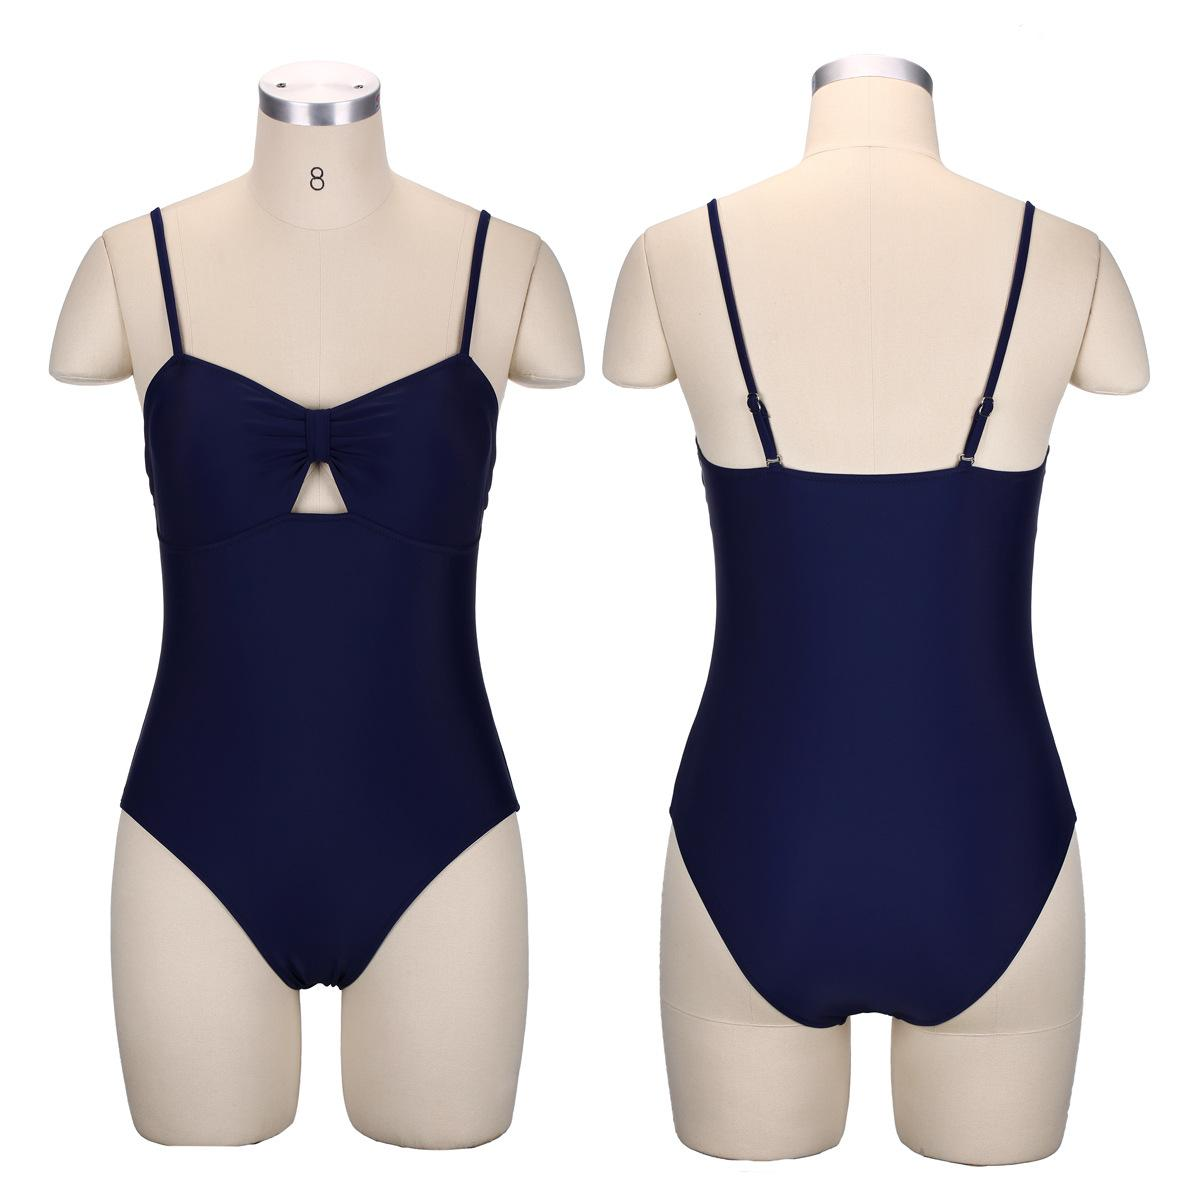 aad97425b1 Bikini Pure-color Conservative Slimming Linkage Swimsuit Women's  Cross-border Swimming Suit